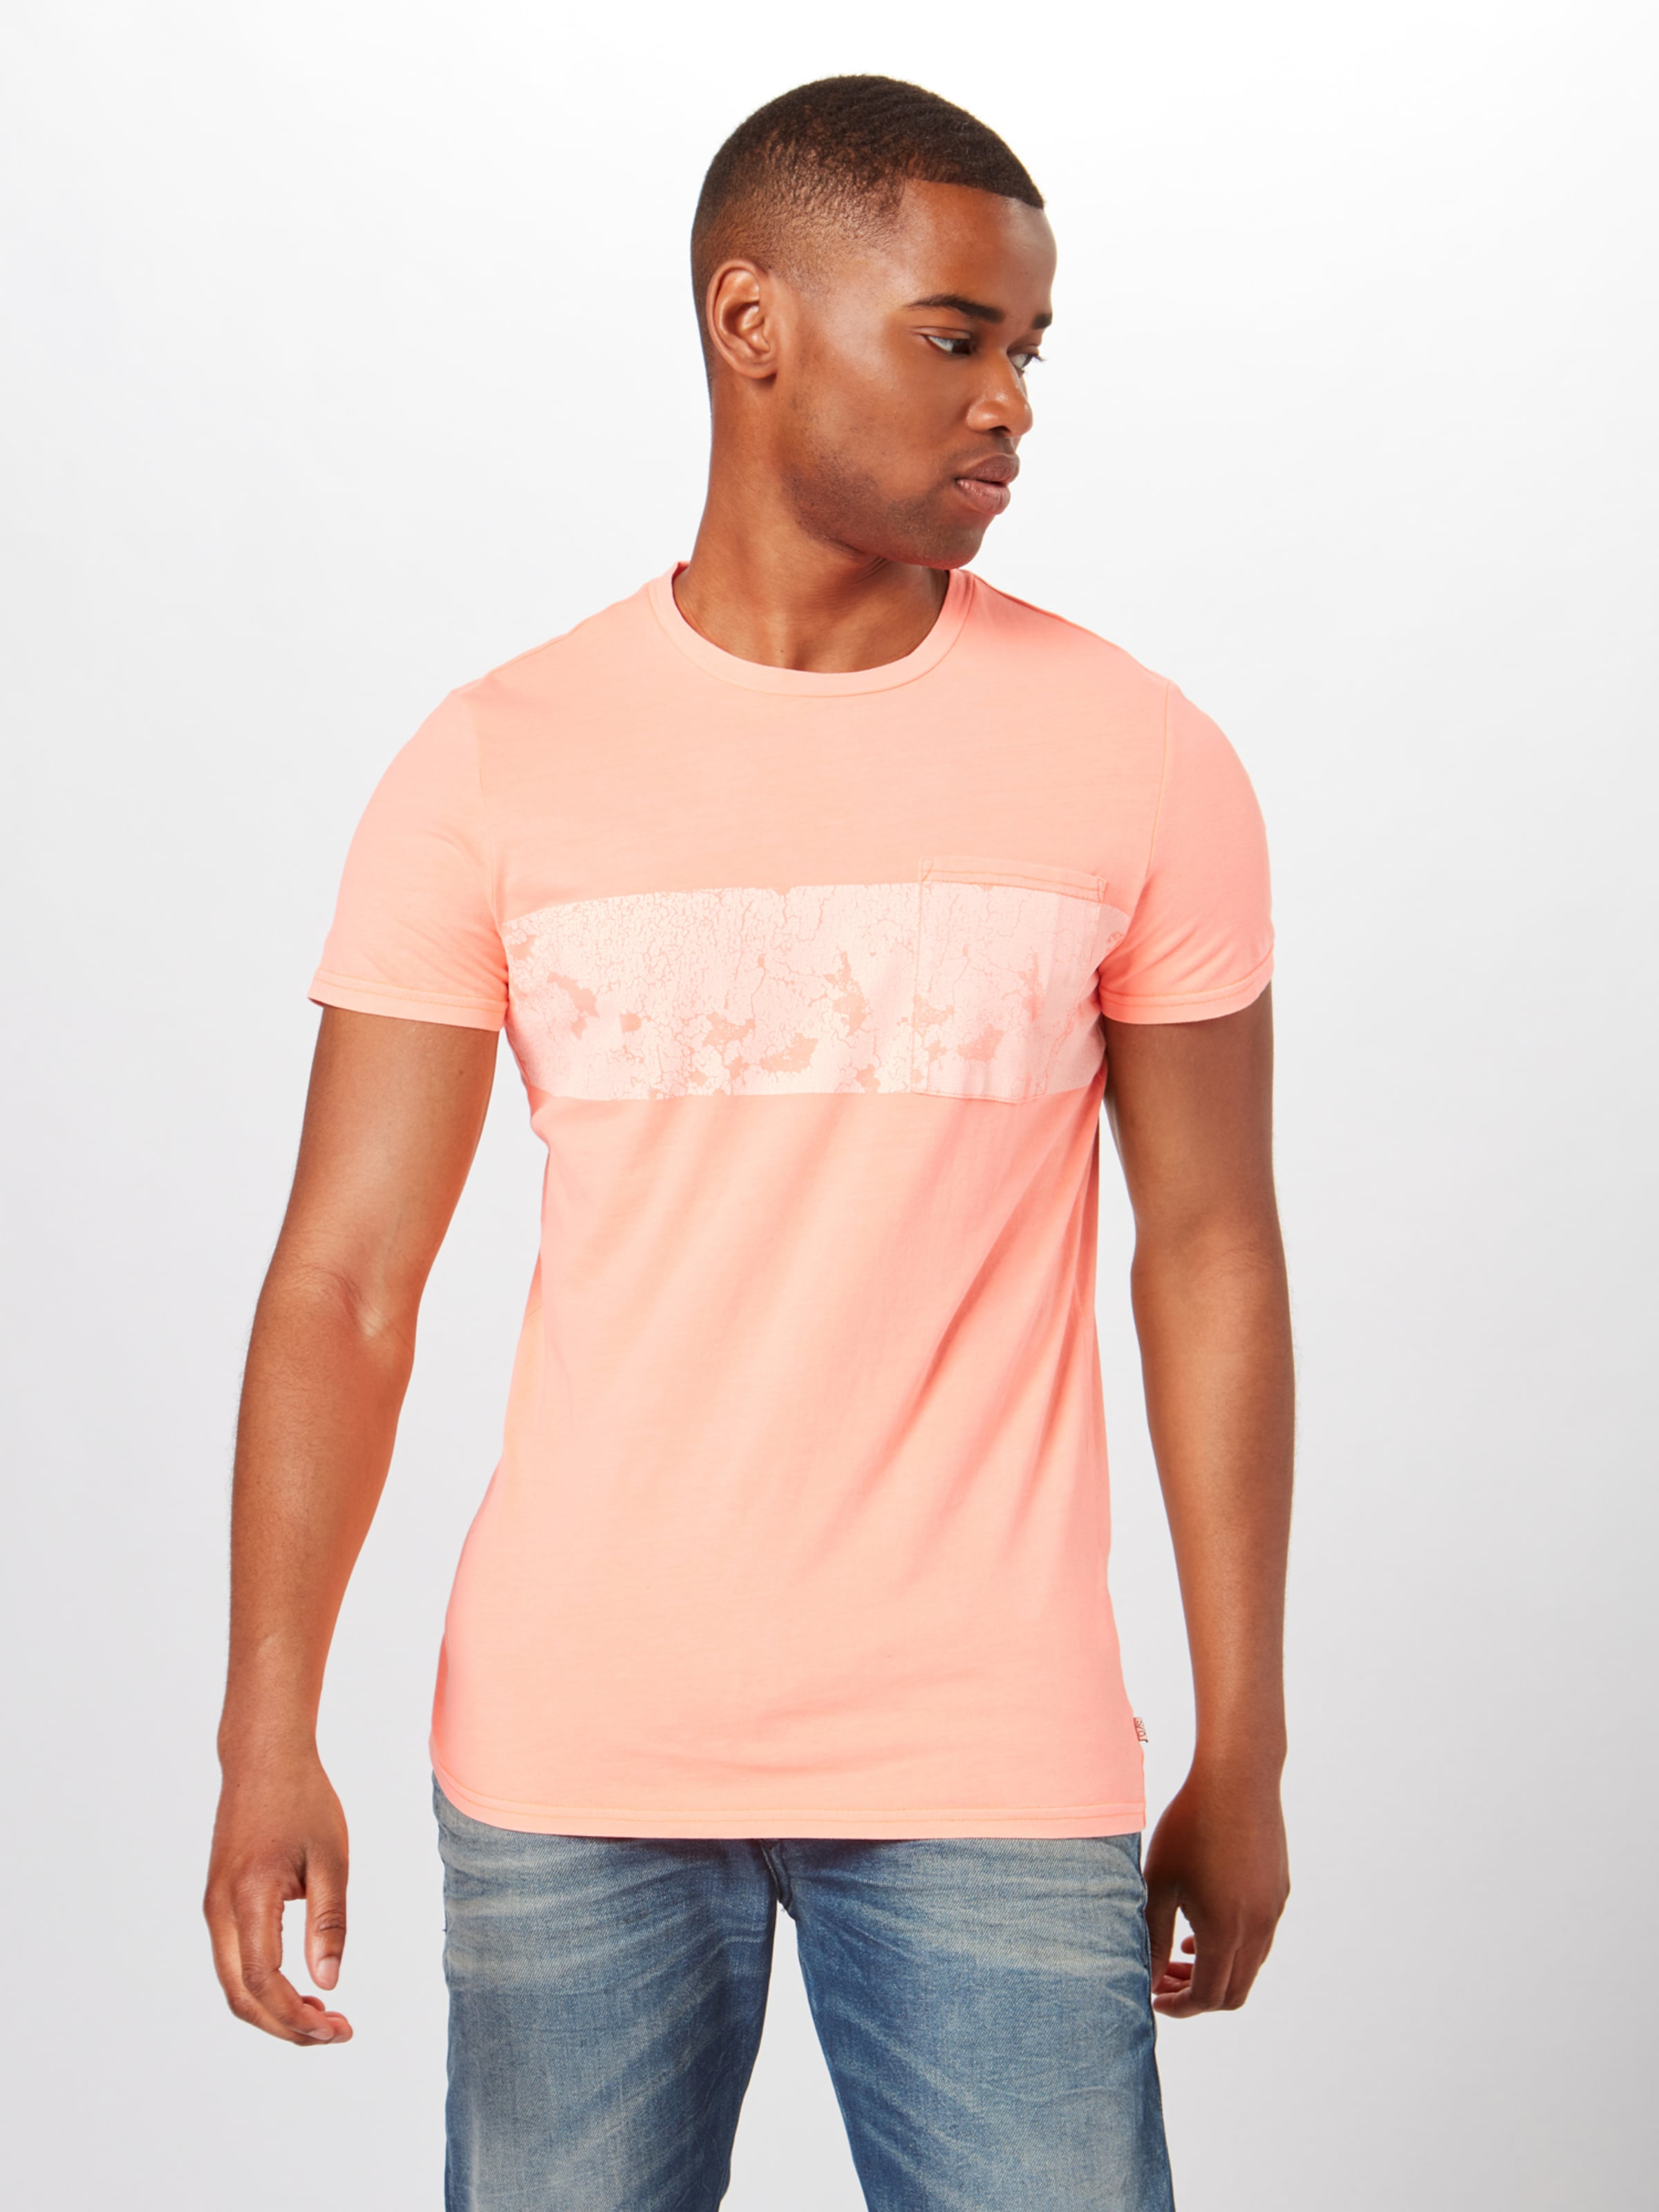 By s In Q Designed Neonorange T shirt deBWrxoQCE